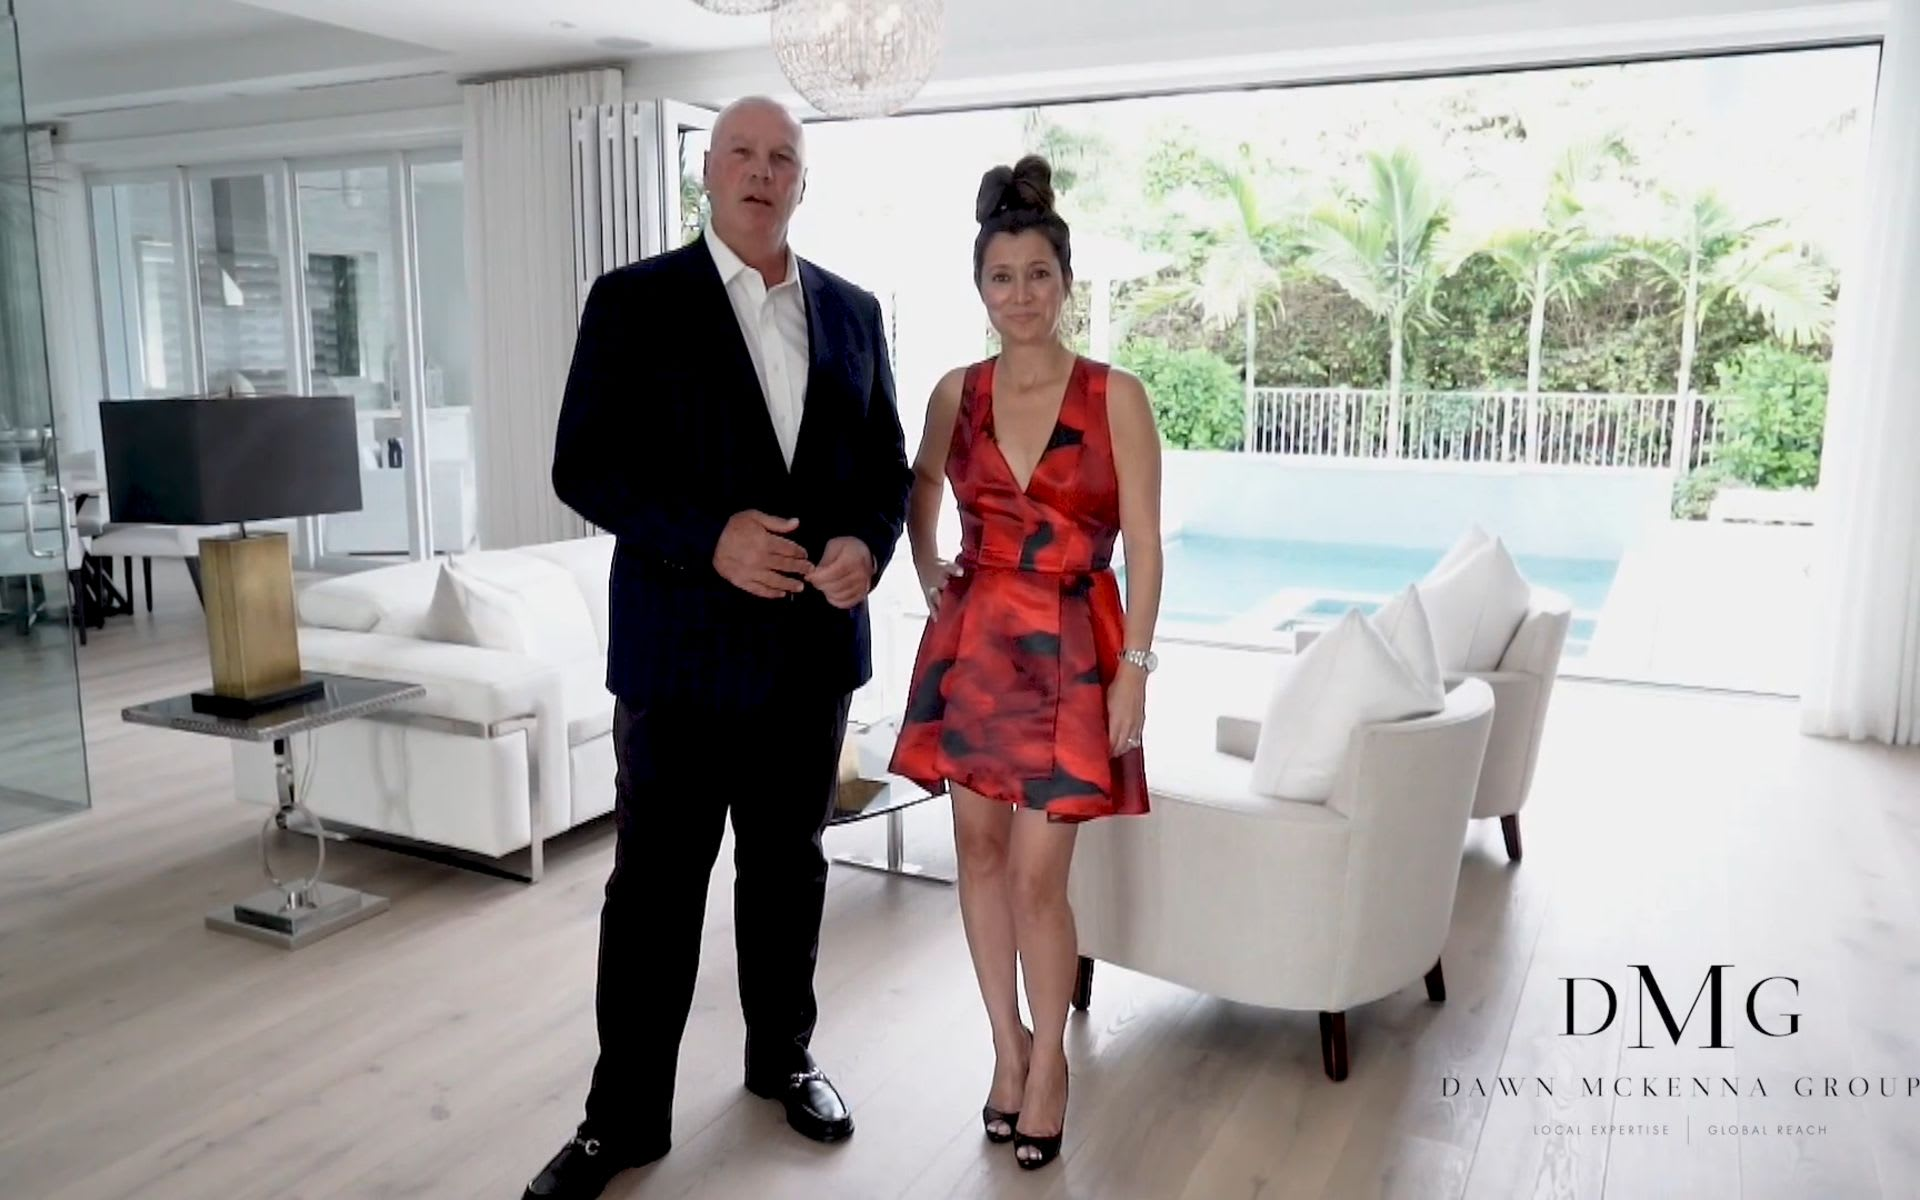 1263 4TH STREET, NAPLES, FL DAWN MCKENNA GROUP video preview